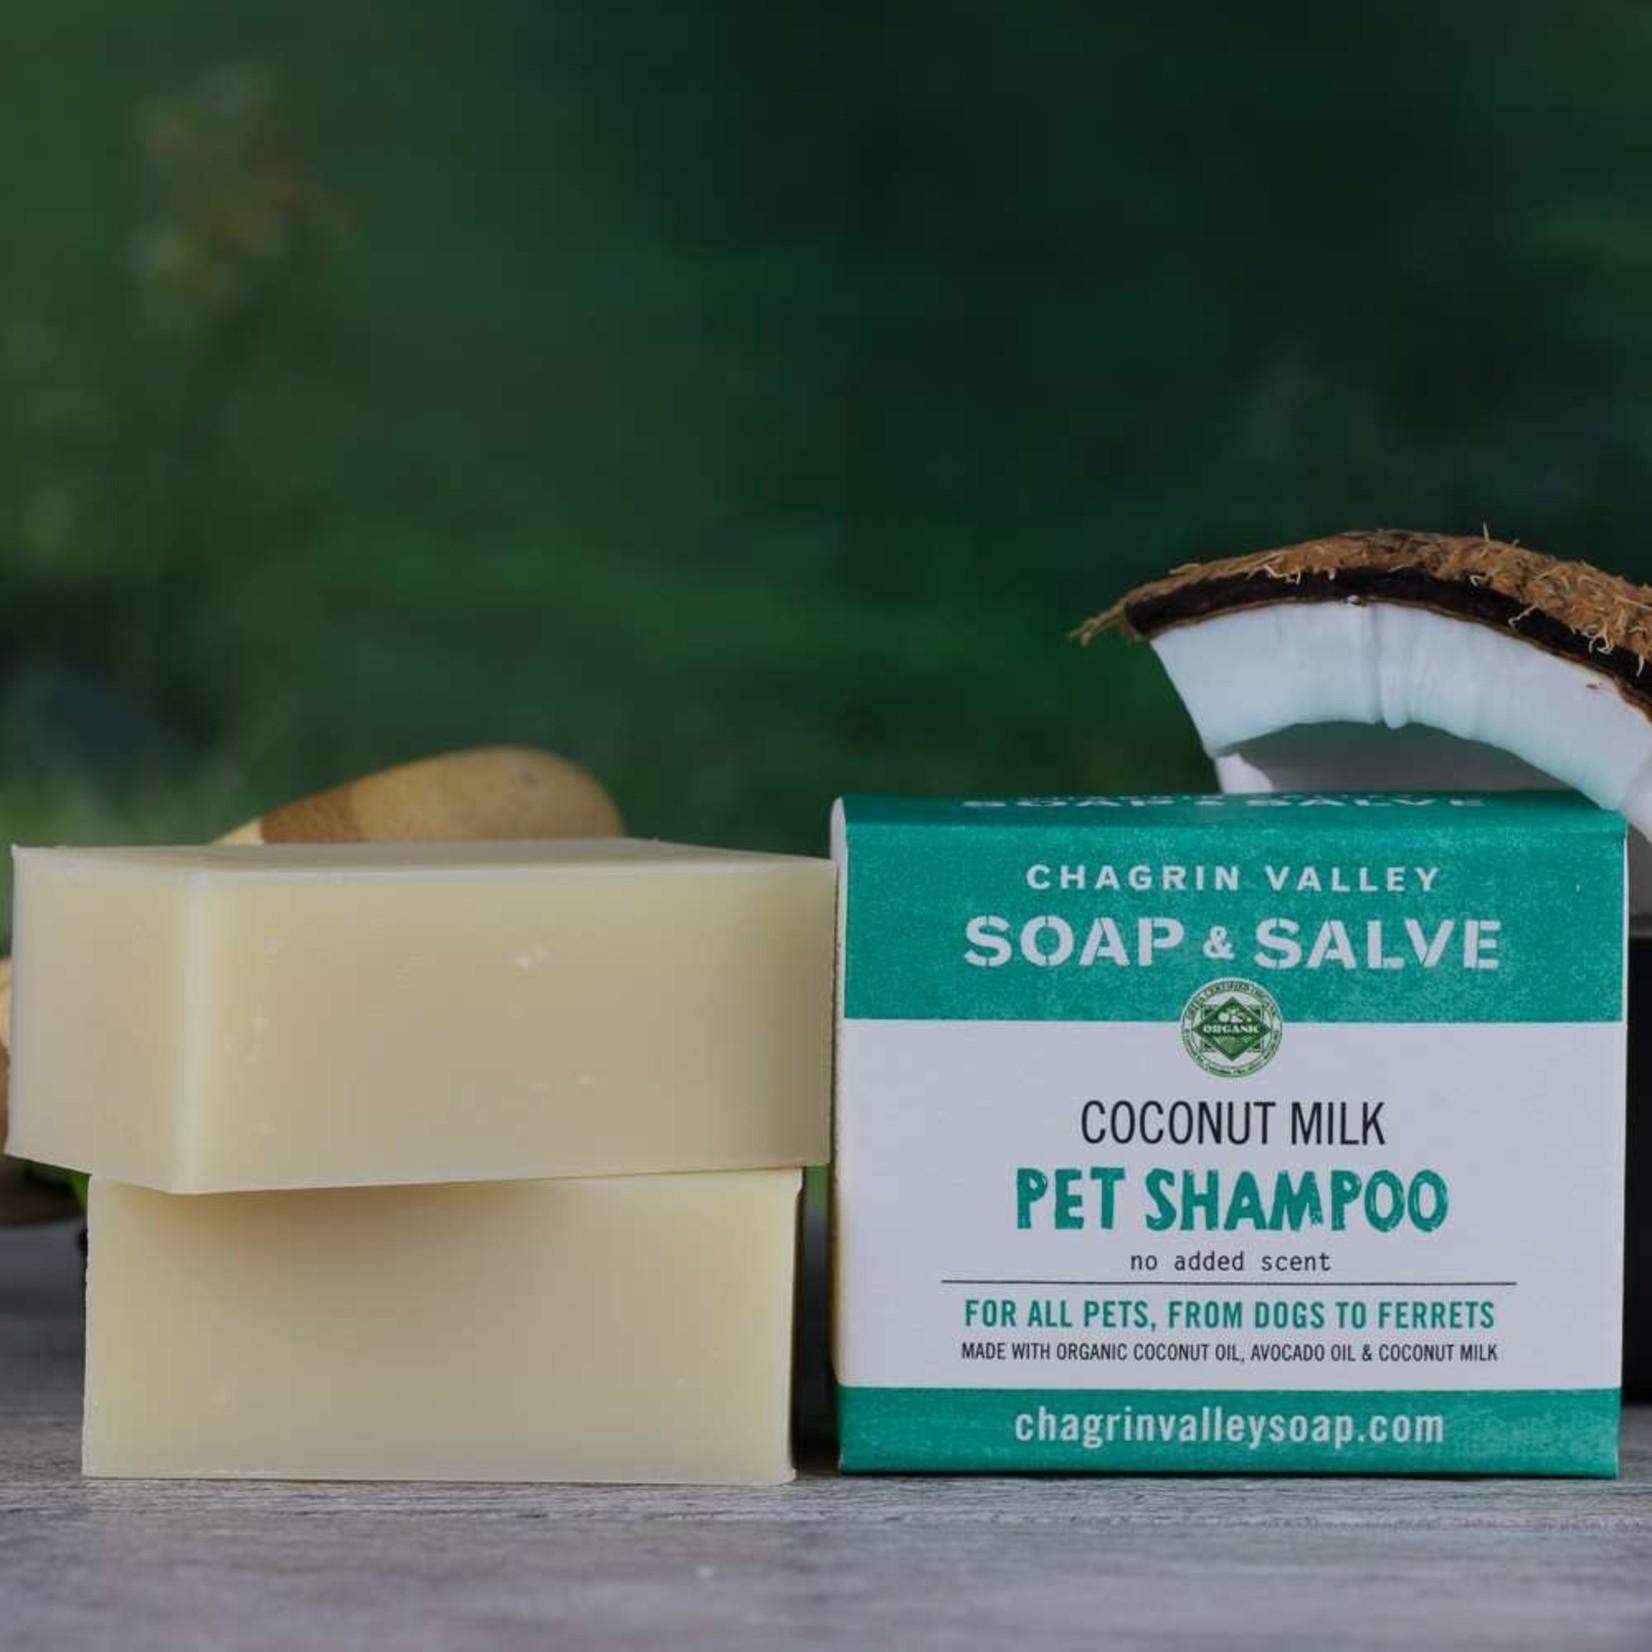 Chagrin Valley Soap and Salve Creamy Coconut Milk Dog/Pet Shampoo Bar